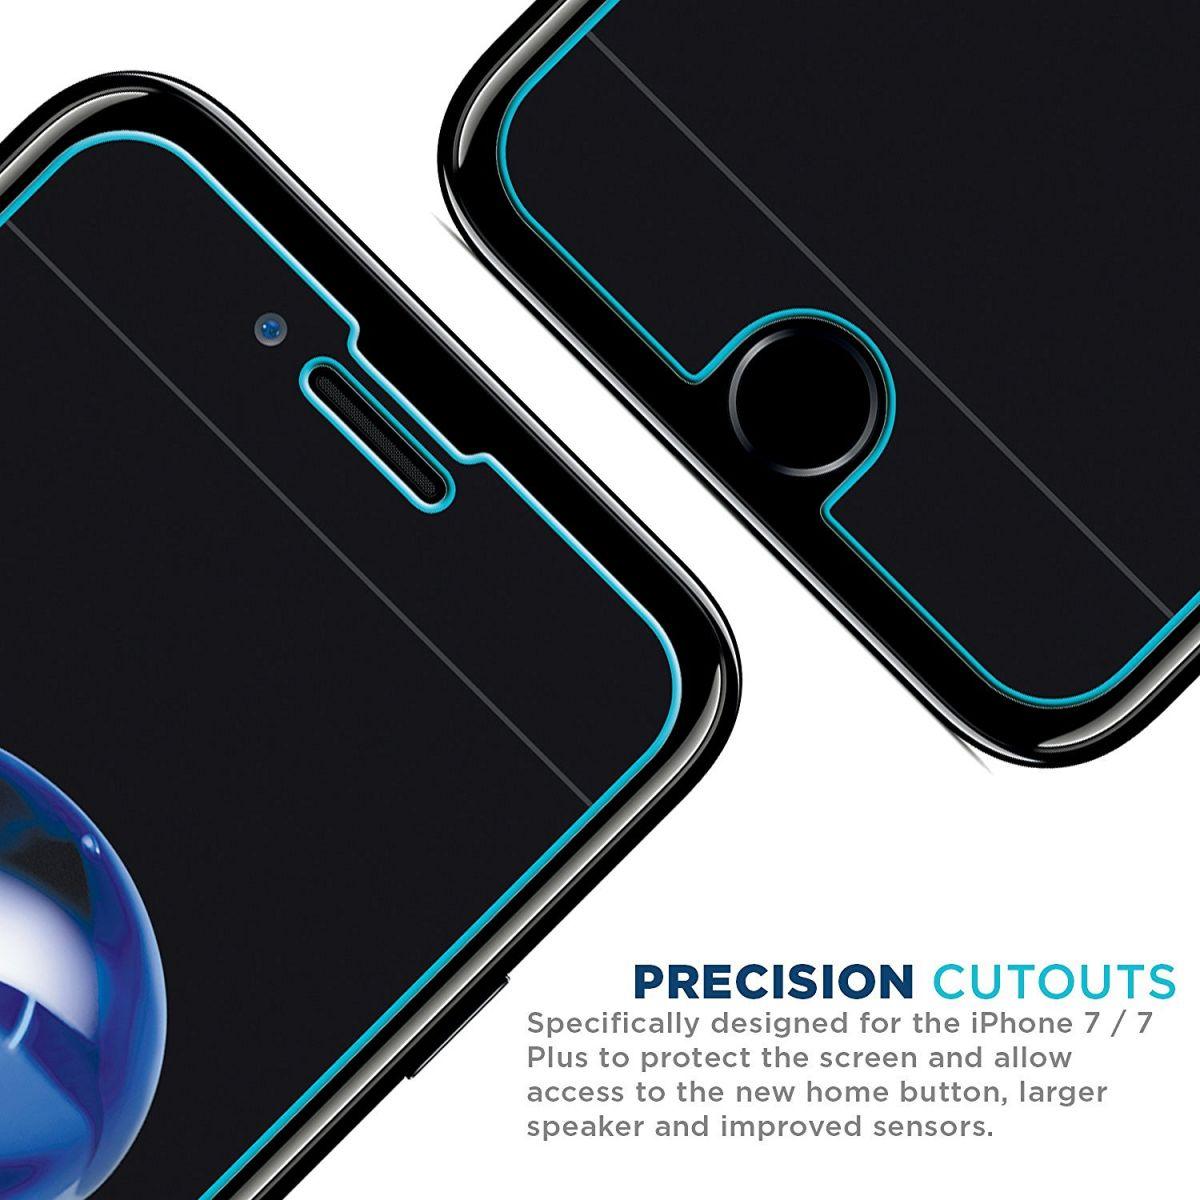 Tvrzené sklo iPhone 7 Plus 7.